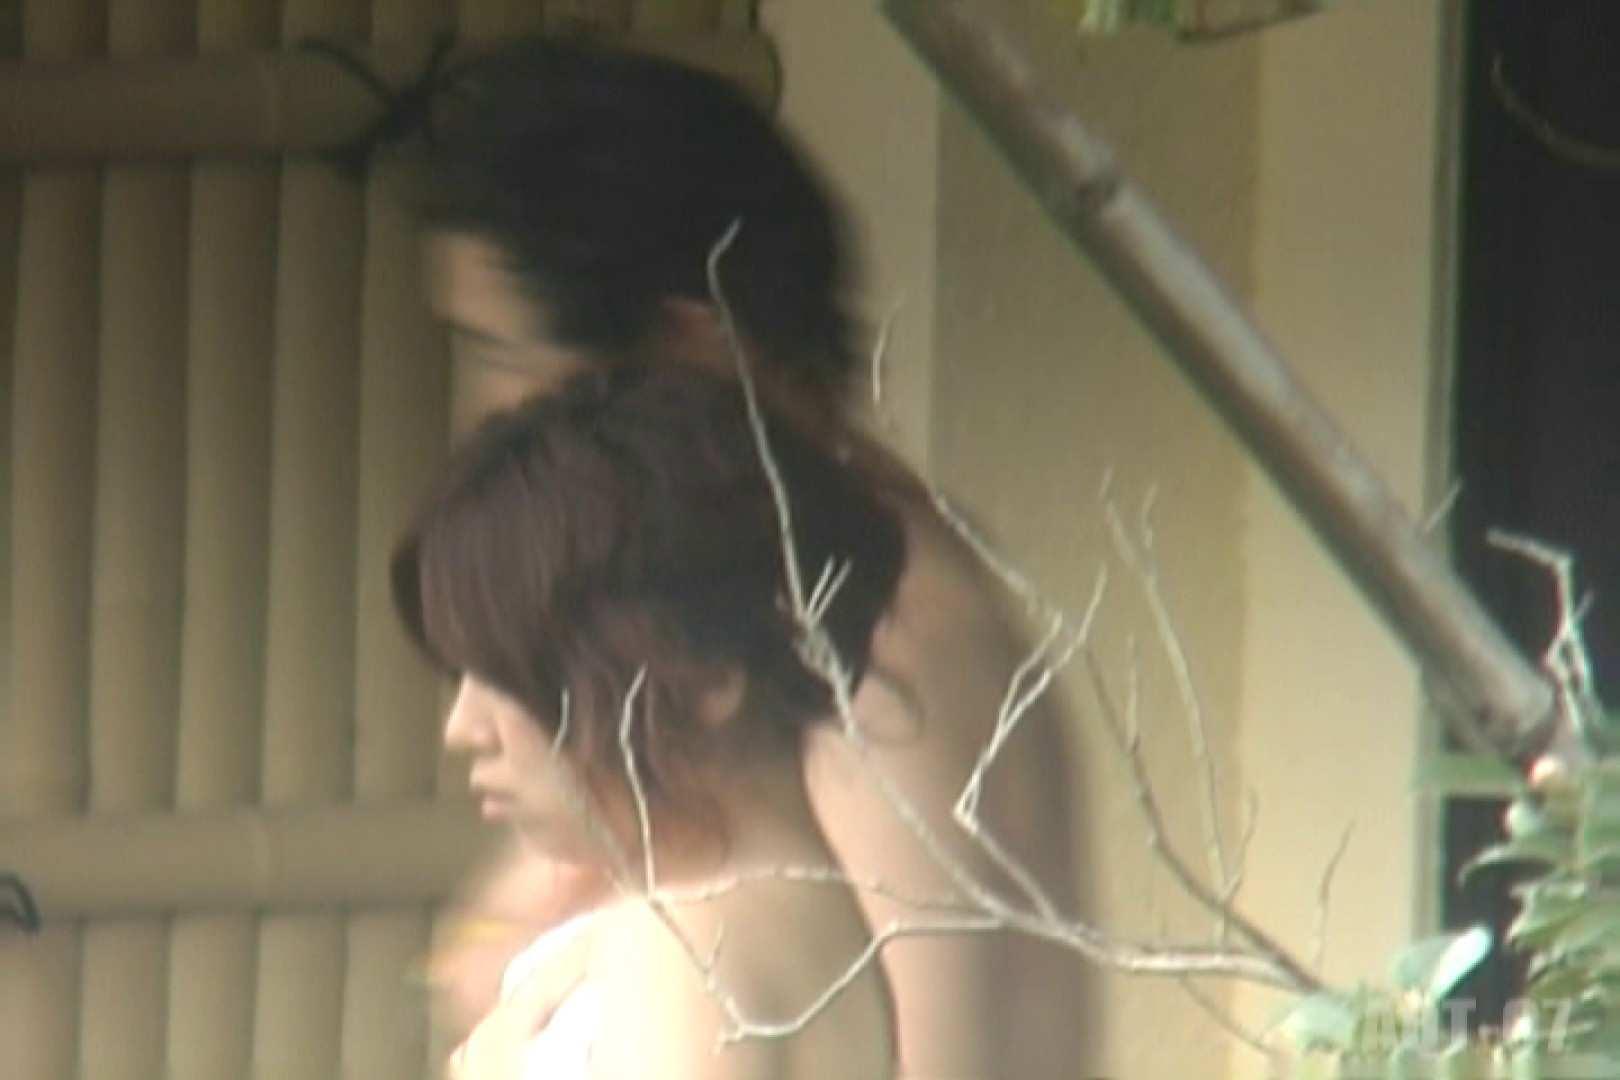 Aquaな露天風呂Vol.764 0 | 0  67連発 51